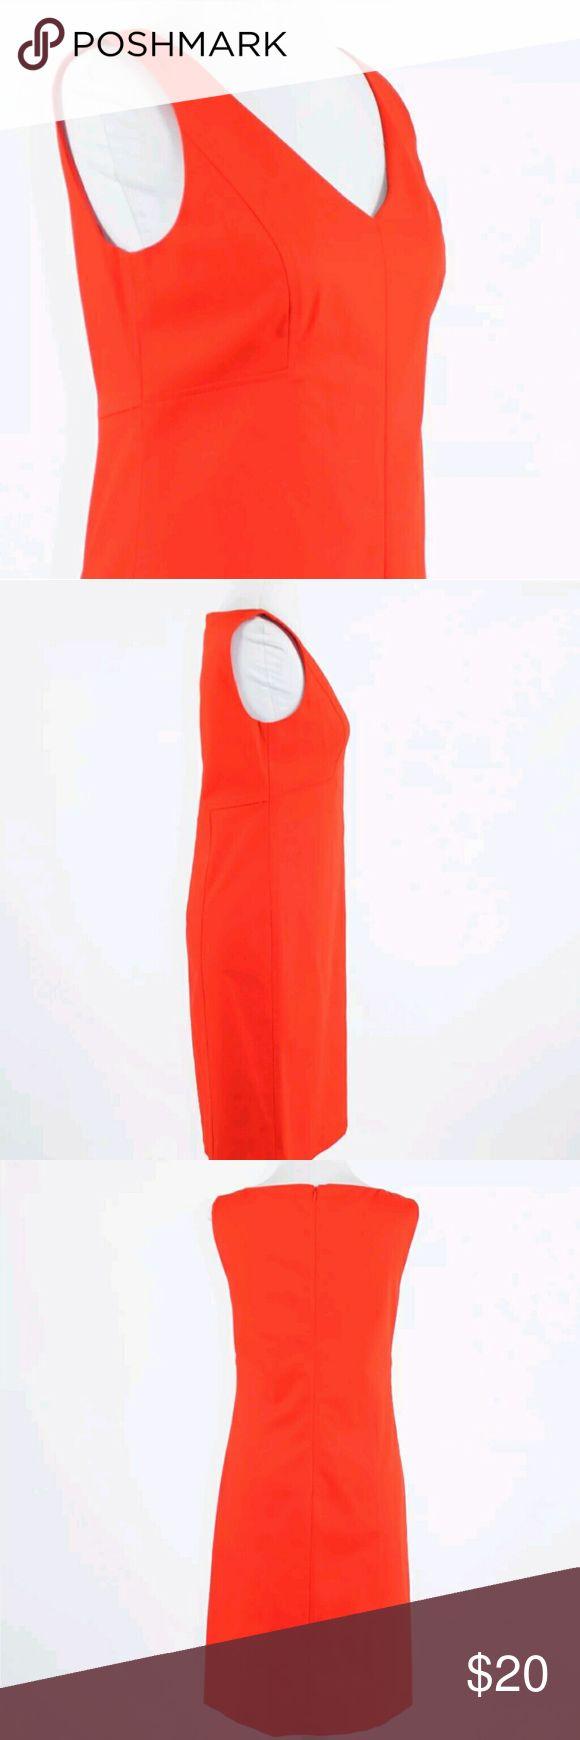 Talbots womens orange dress Orange cotton blend TALBOTS sleeveless V-neck sheath dress 4 petite Talbots Dresses Midi